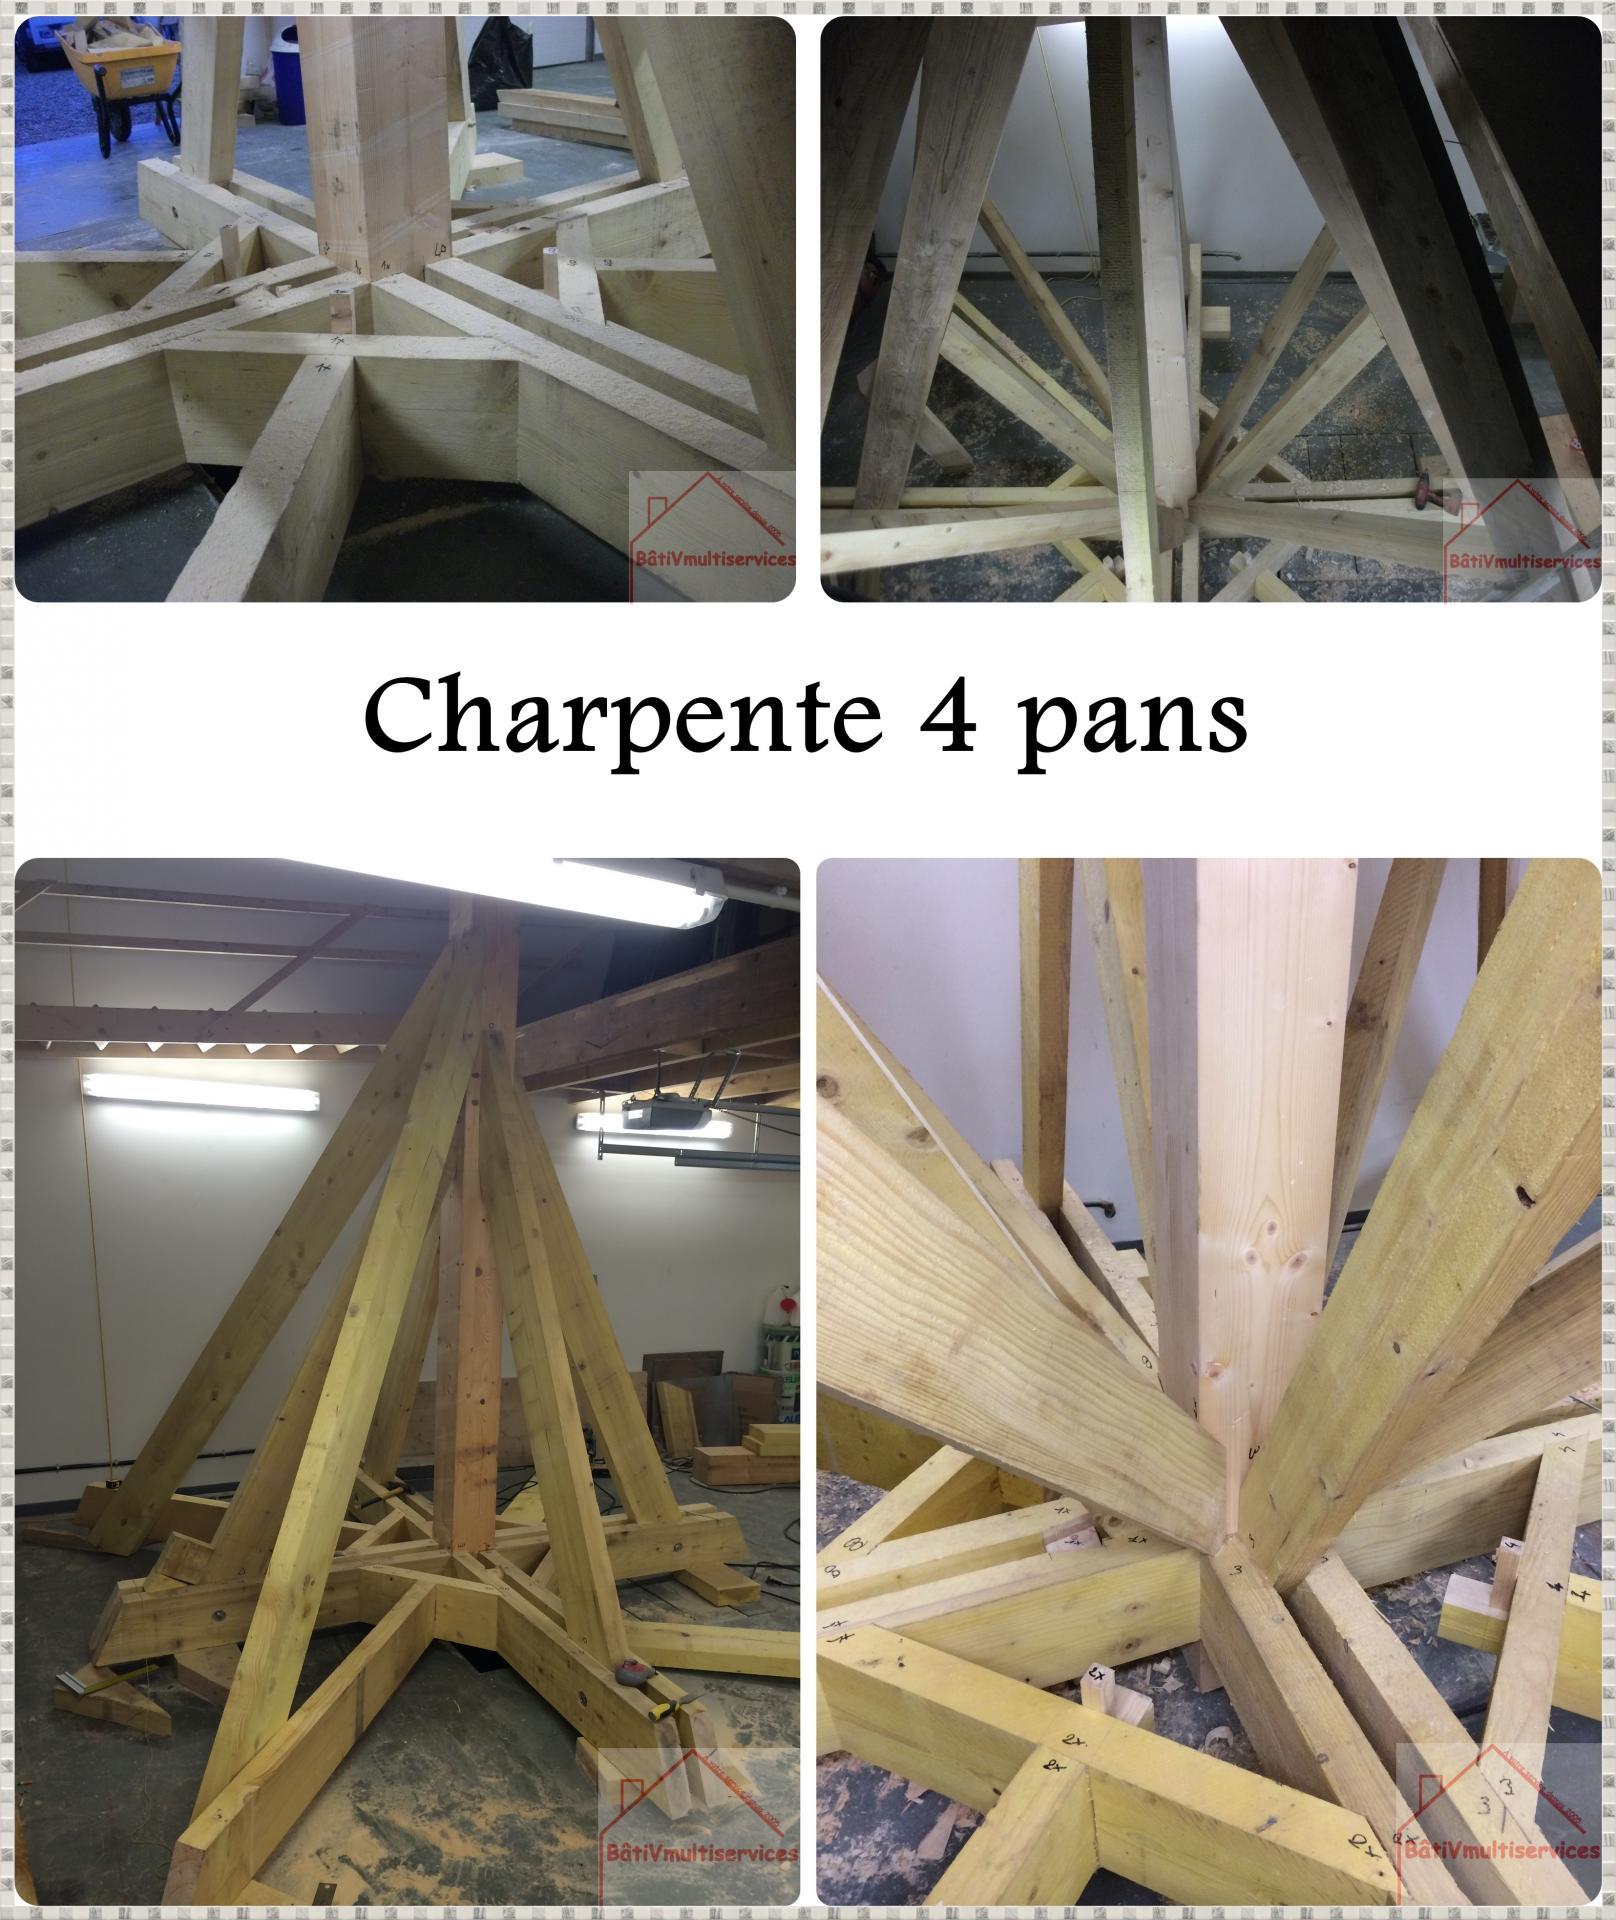 charpente 4 pans